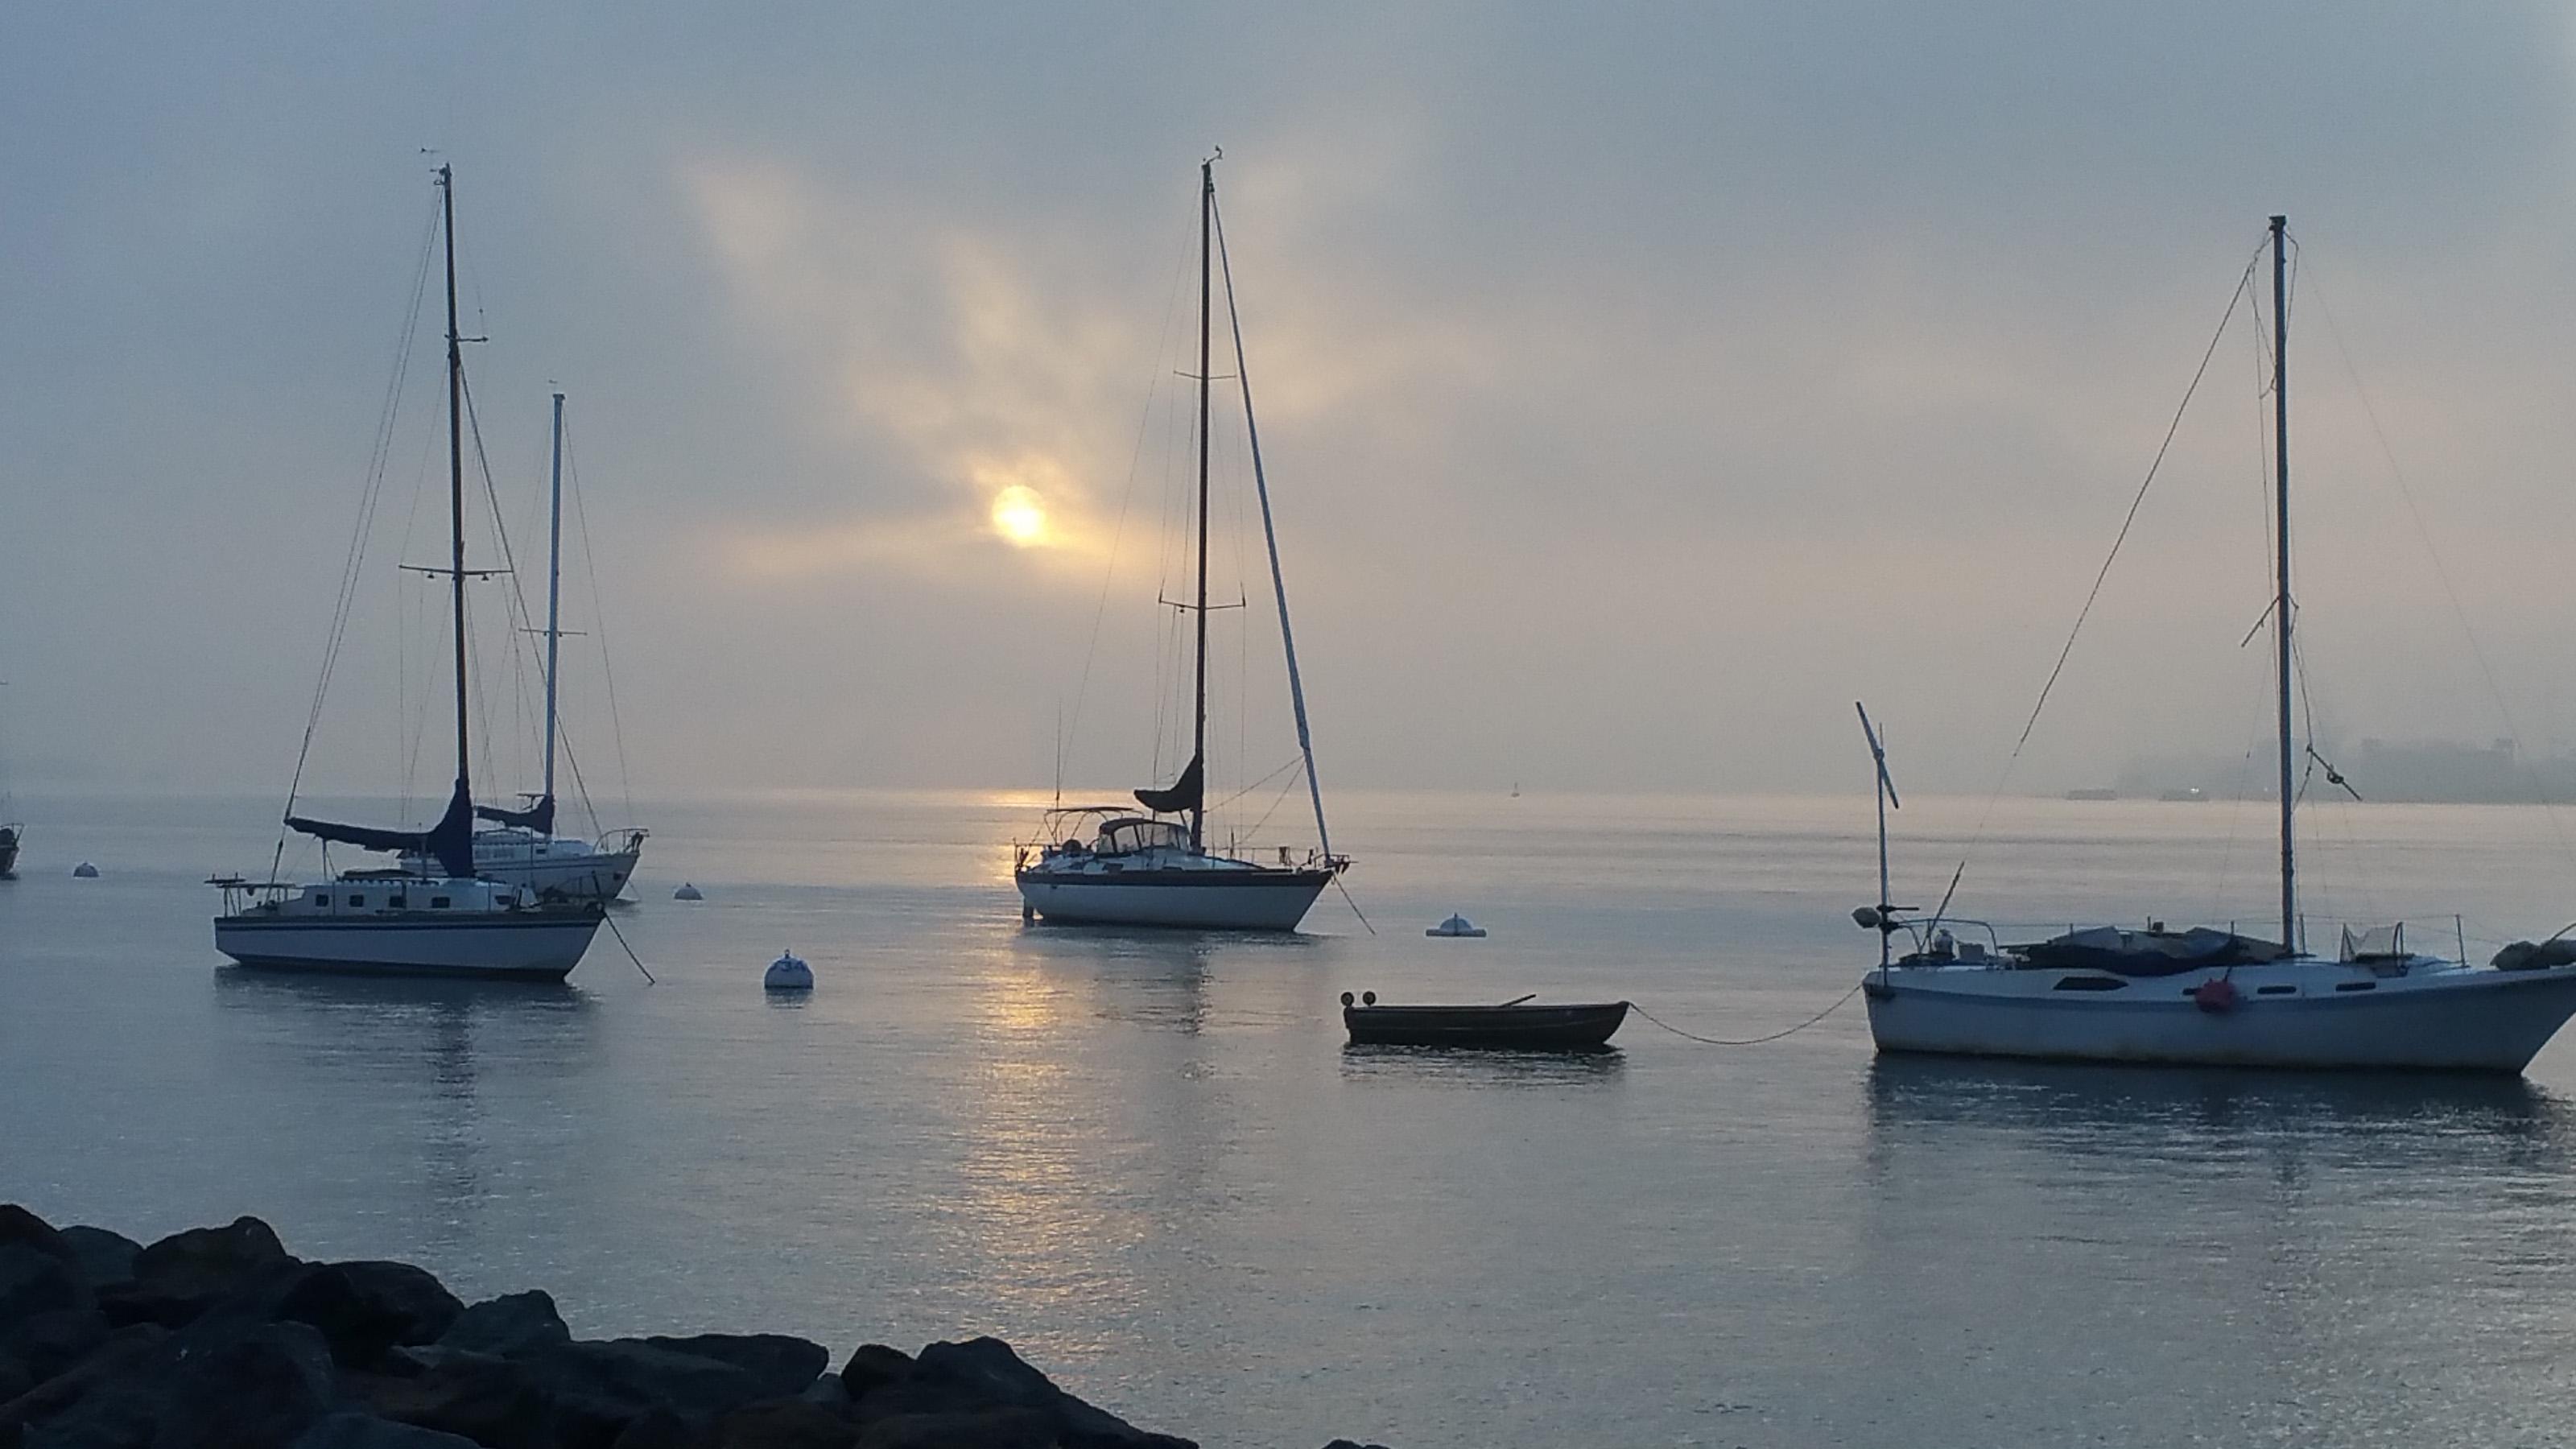 Three sail boats in San Diego Bay